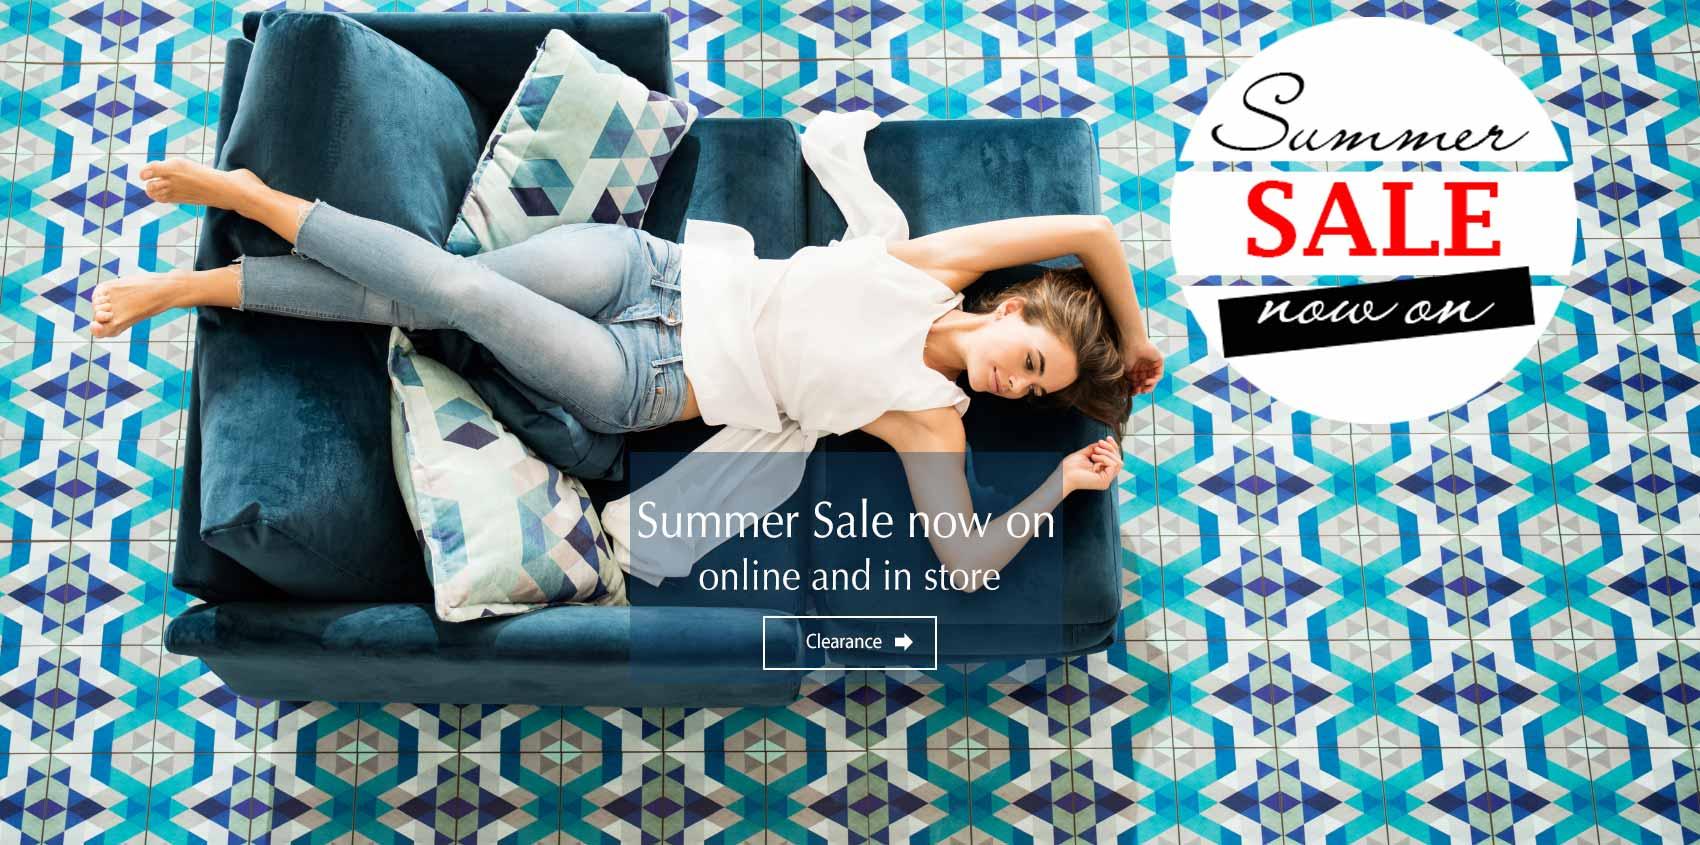 Insitu Summer Sale Now On